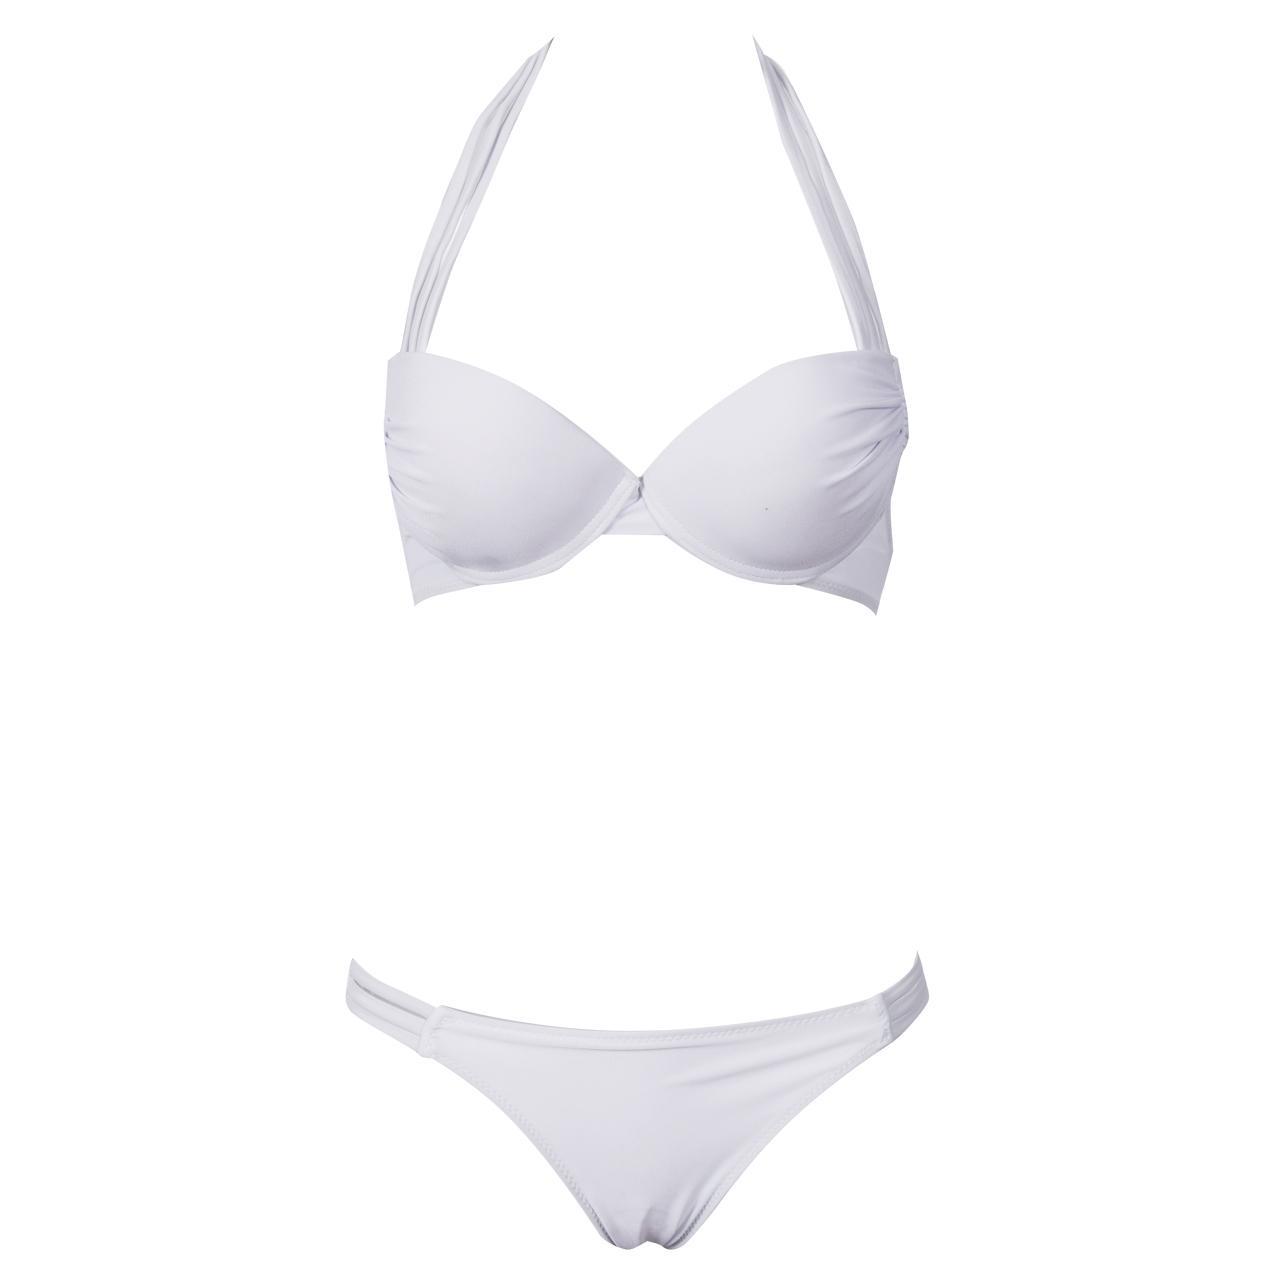 2017 Mulheres Meninas Swimwear Push-up acolchoado Bra Biquinis Set Swimsuit Maiô Swimwear Mulheres Sexy Beachwear Praia Belt Outwear